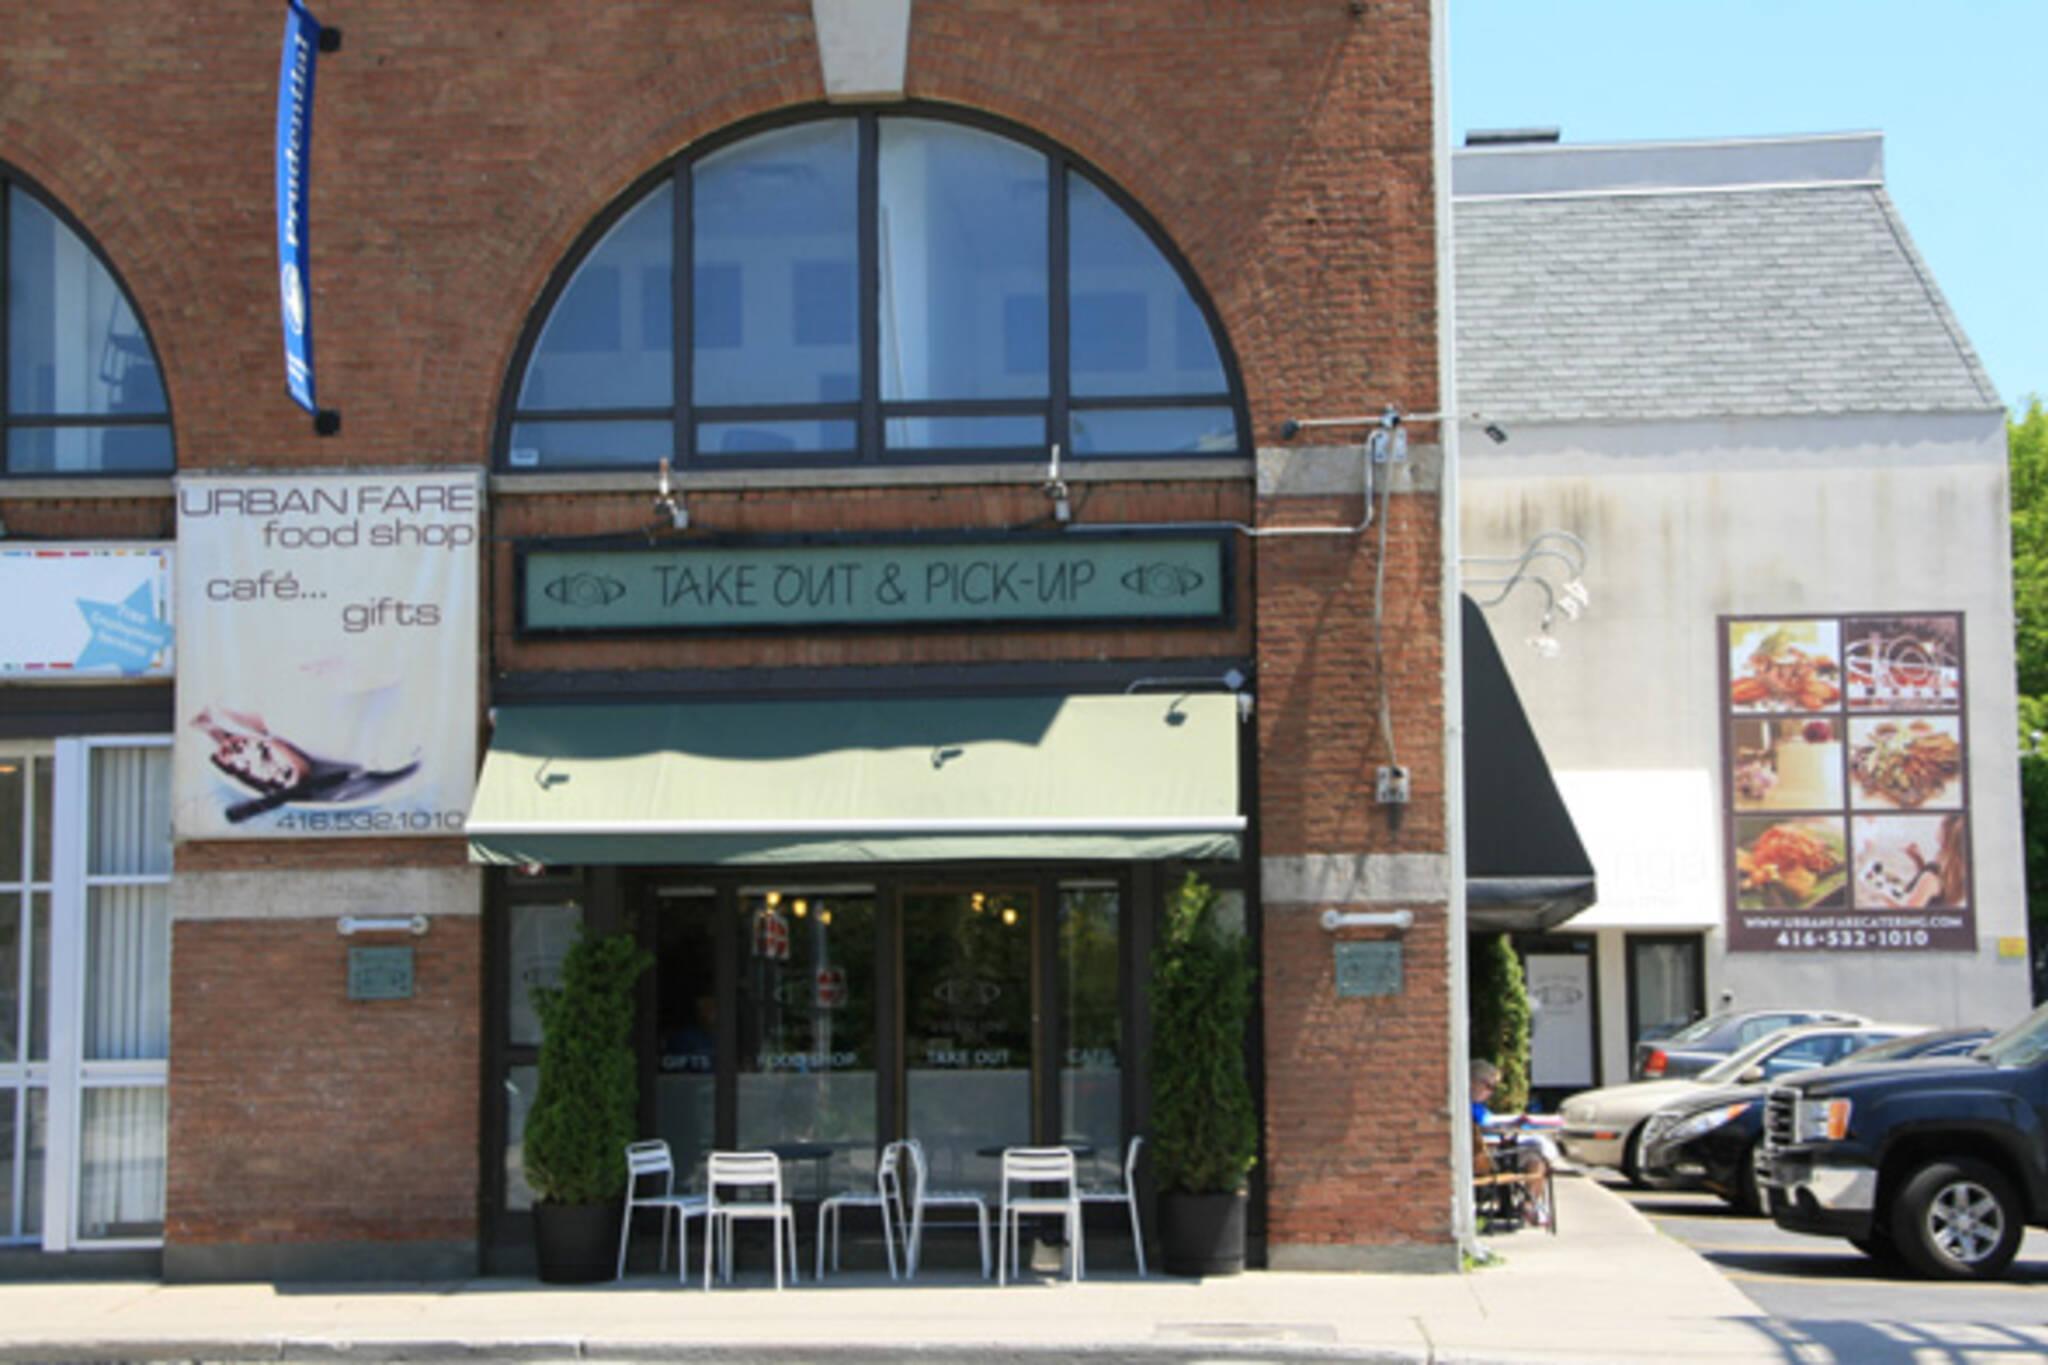 Urban Fare Food Shop